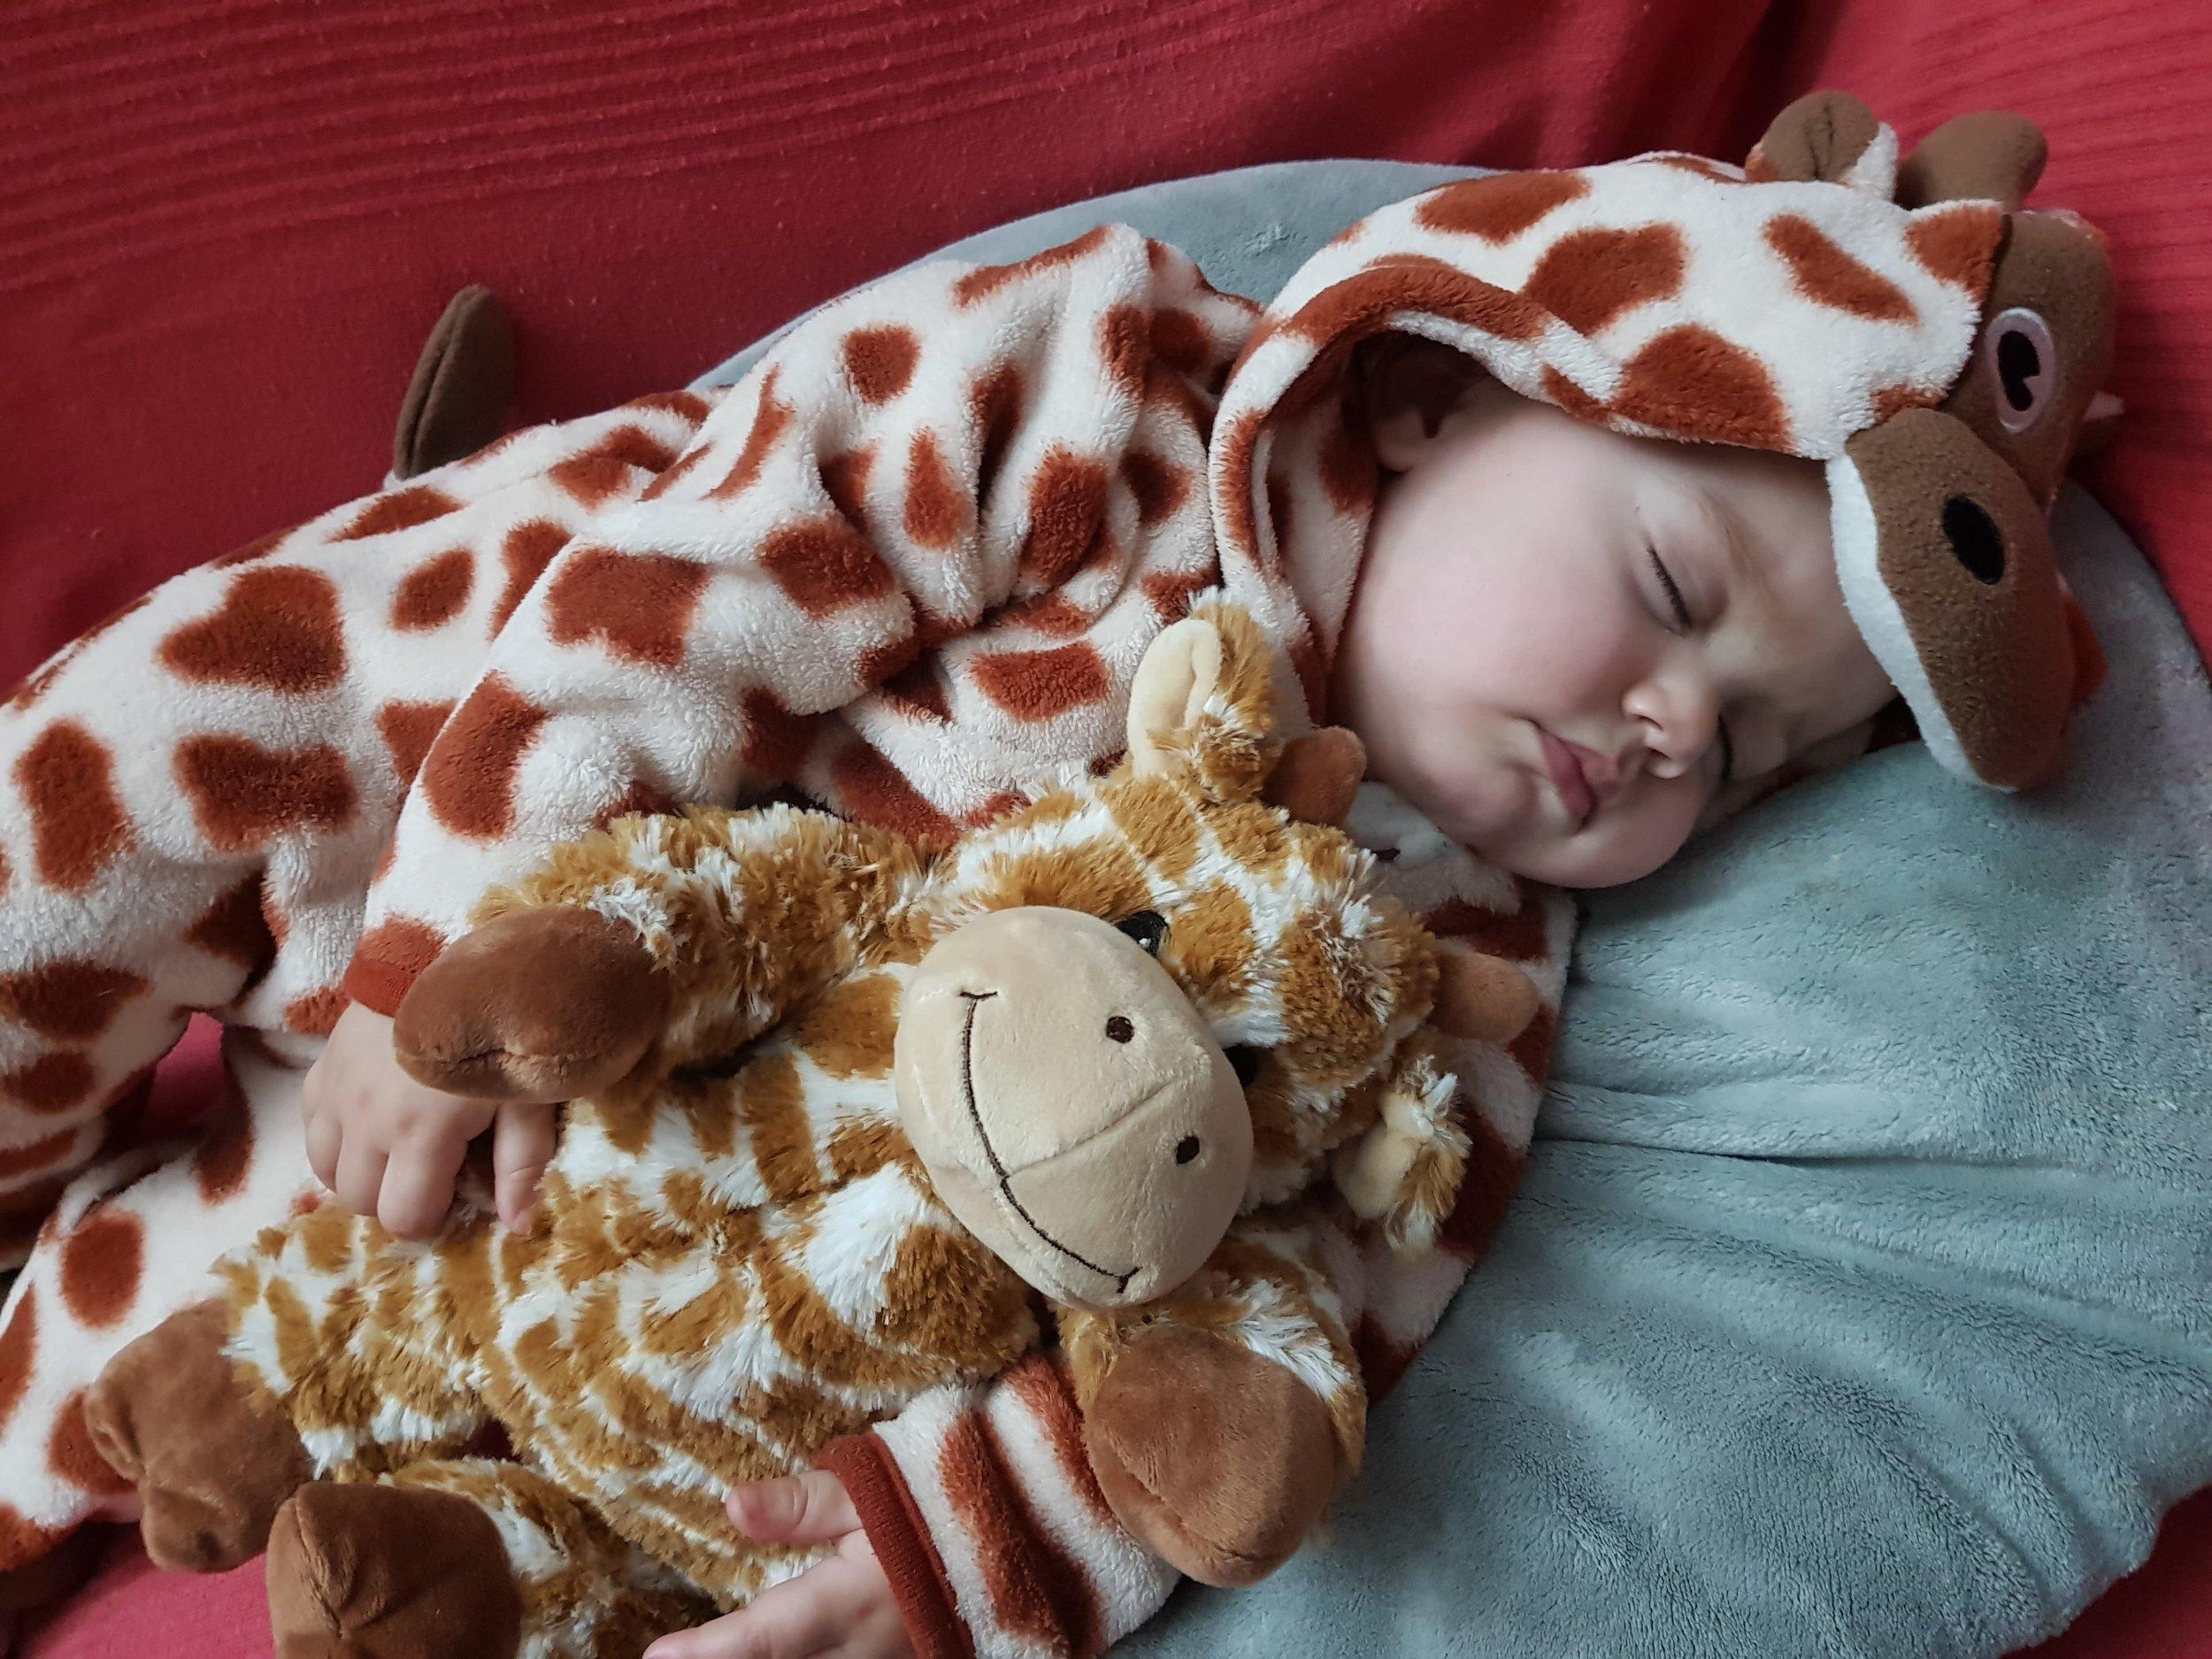 hotwaterbottleshop.co.uk Plush Microwavable Giraffe